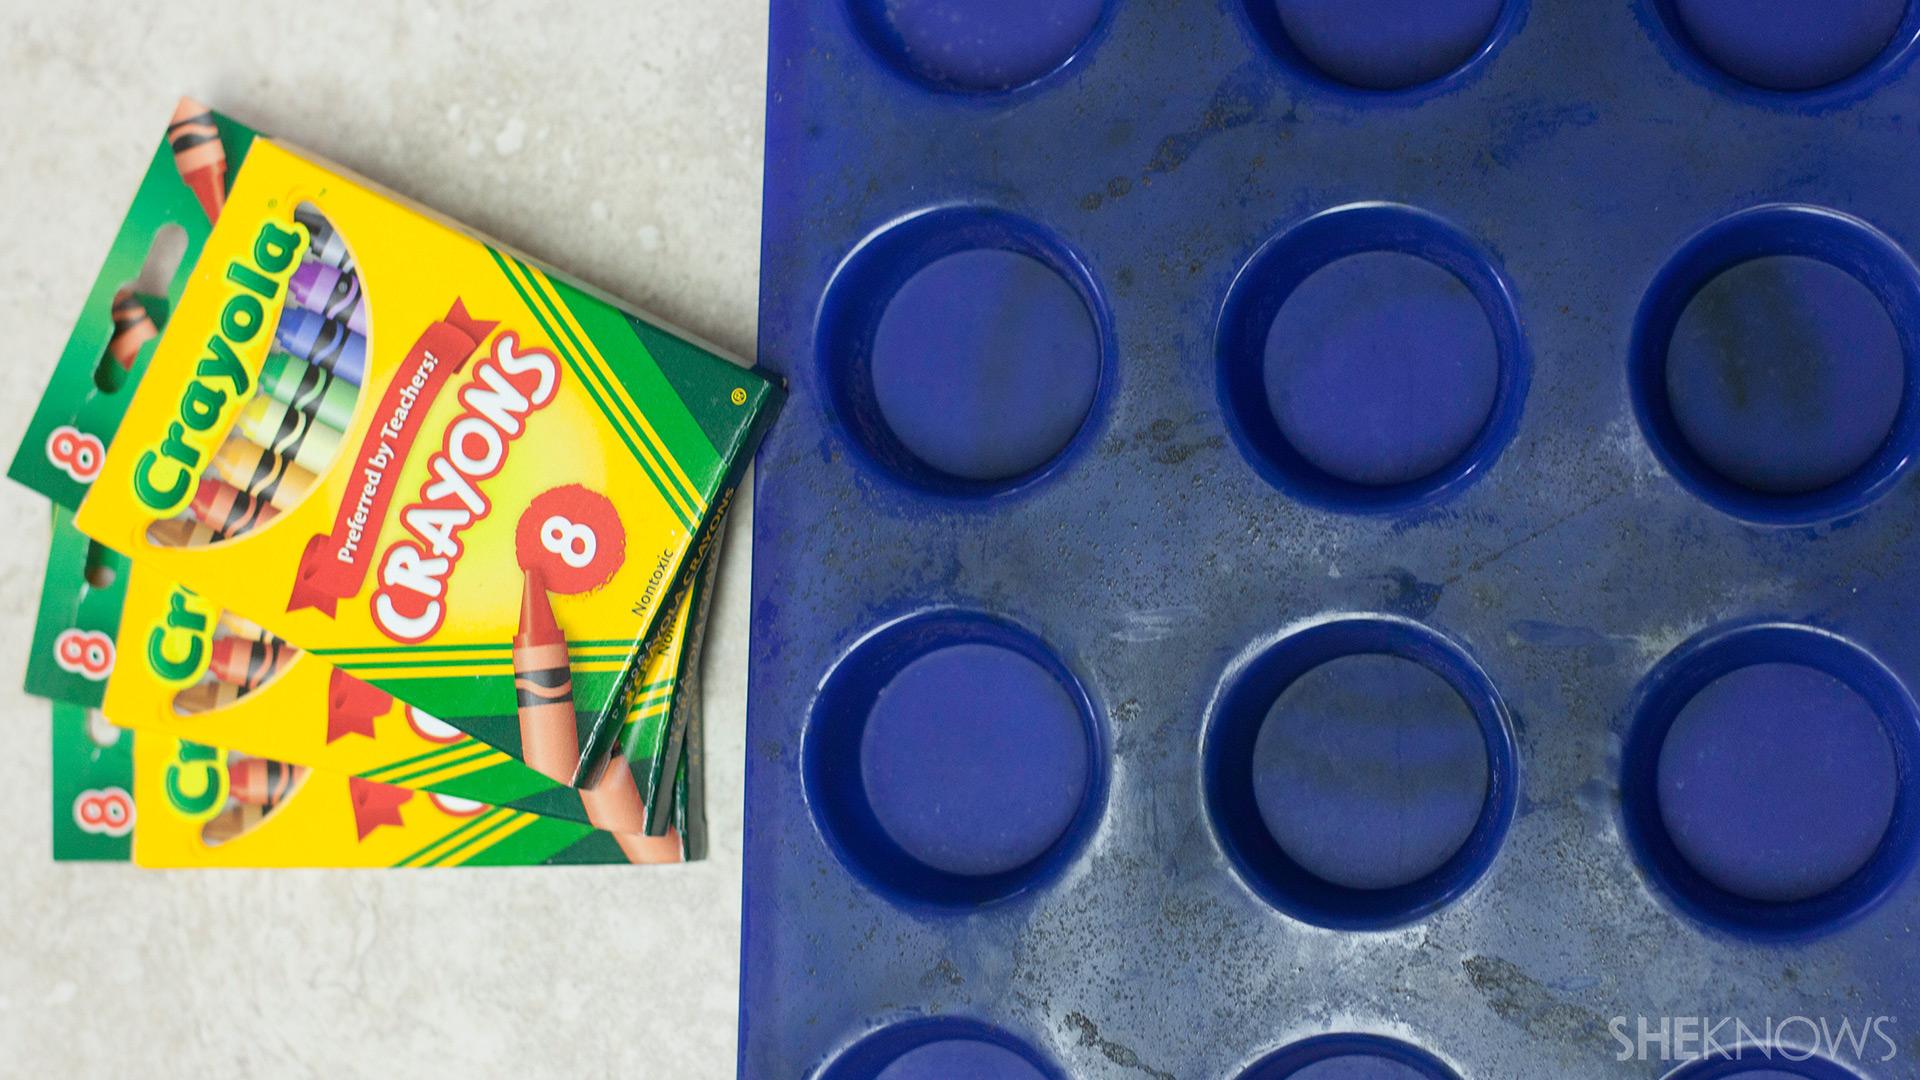 Toddler crayon   Sheknows.com - Supplies